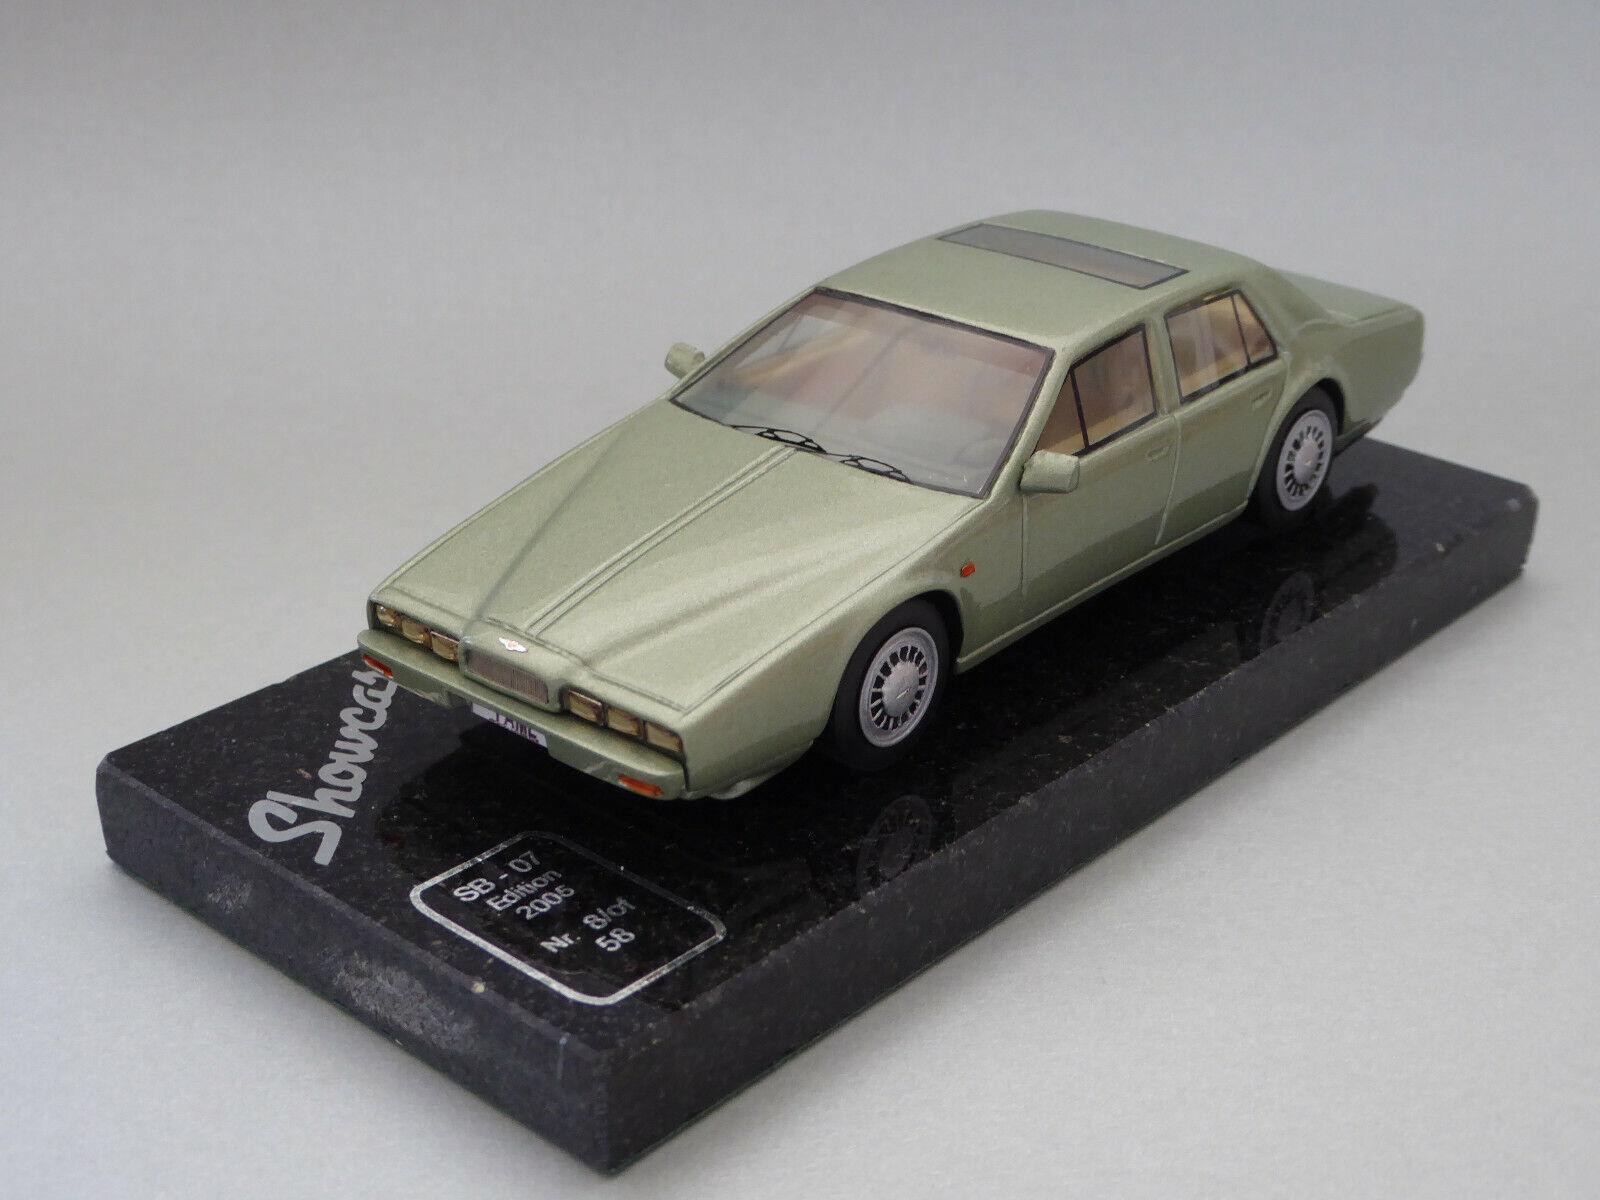 Showcase 07 Aston Martin Lagonda V8 Series 4 '87 n Heco Provence Moulage 1 43